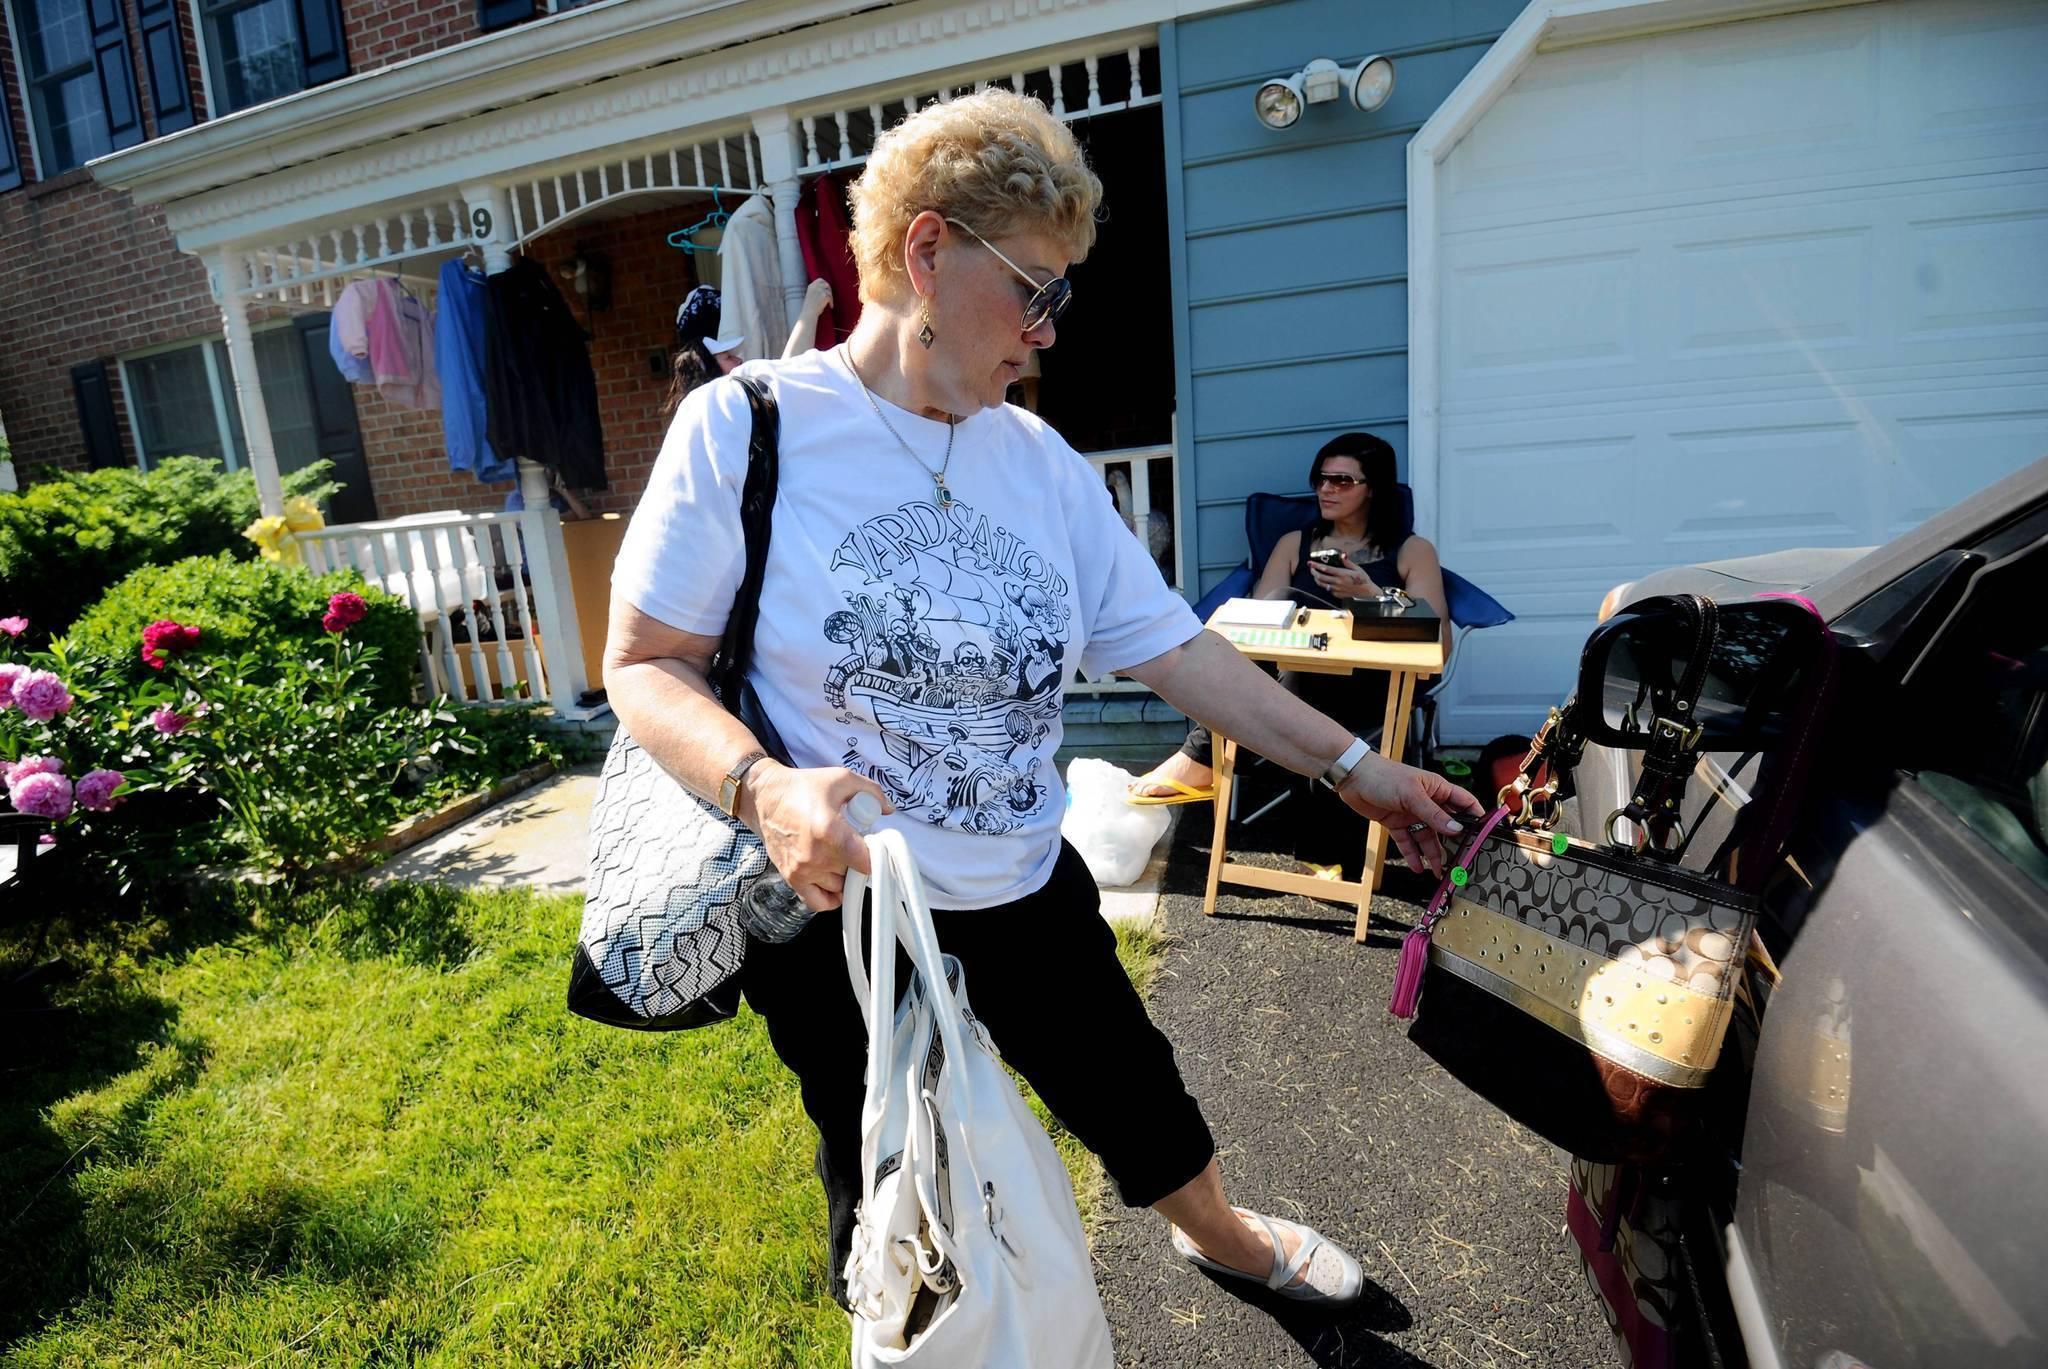 yard sale junkies are in full summer season swing baltimore sun